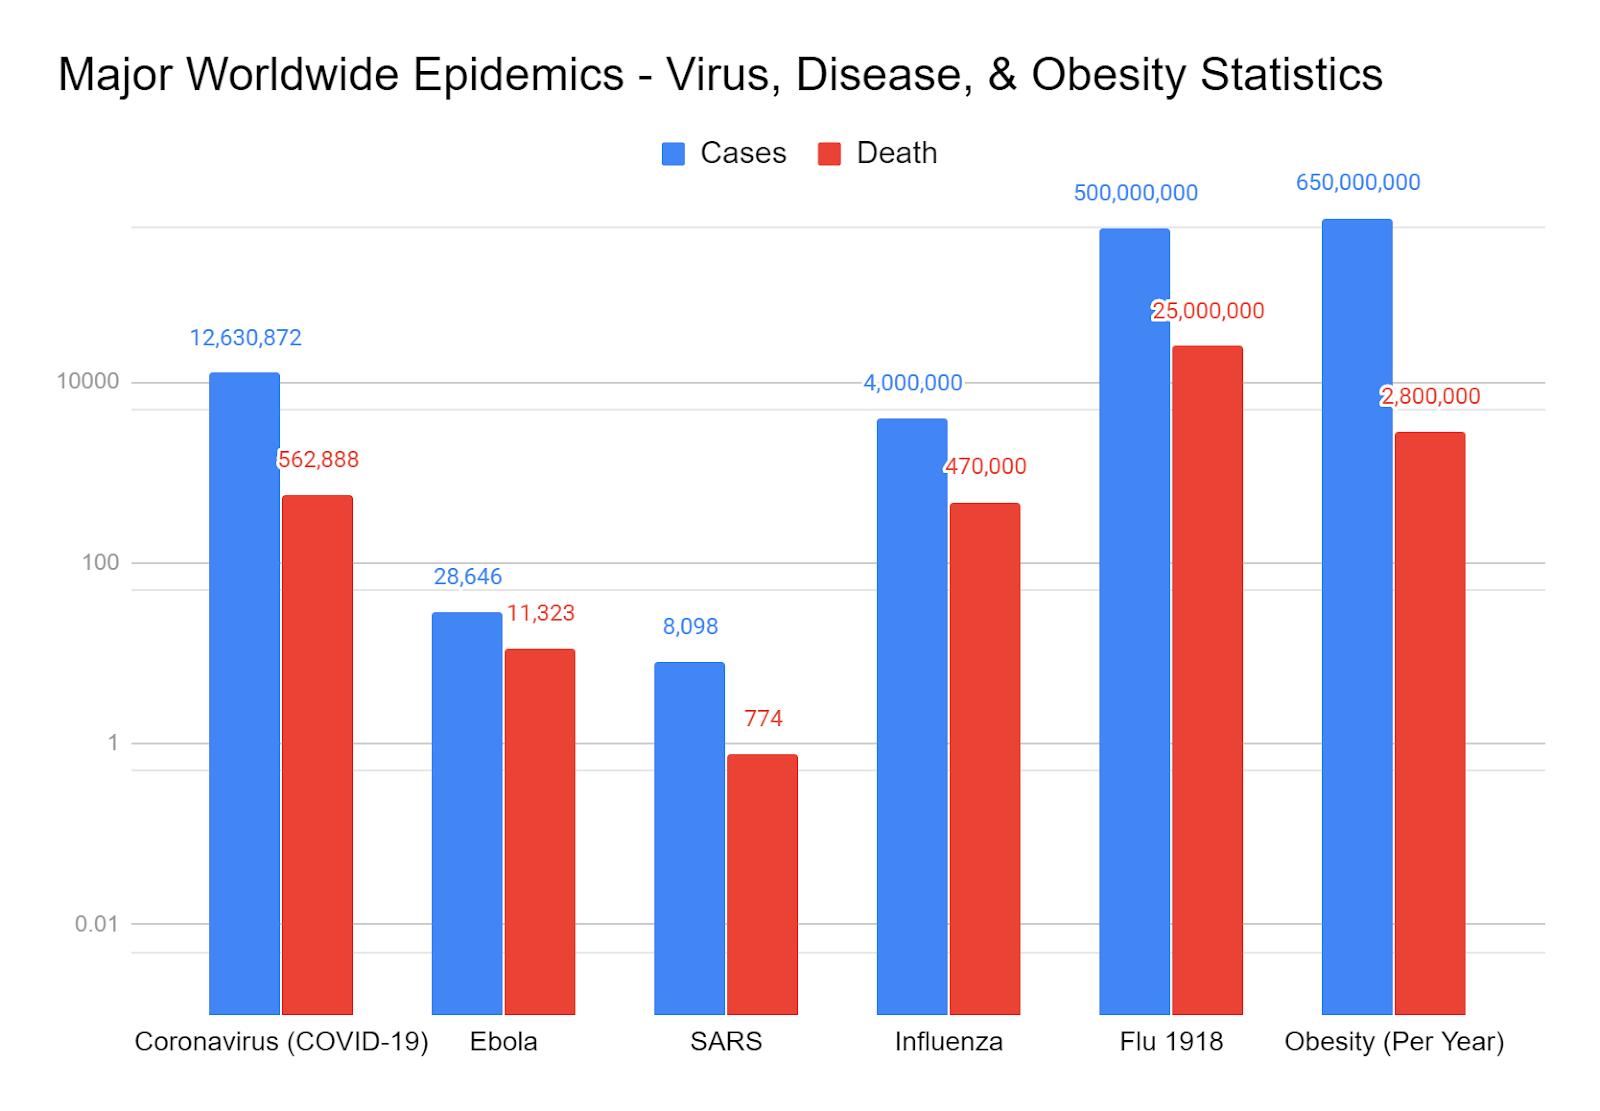 Major Worldwide Epidemics - COVID-19, Disease, & Obesity Statistics (August 2020)